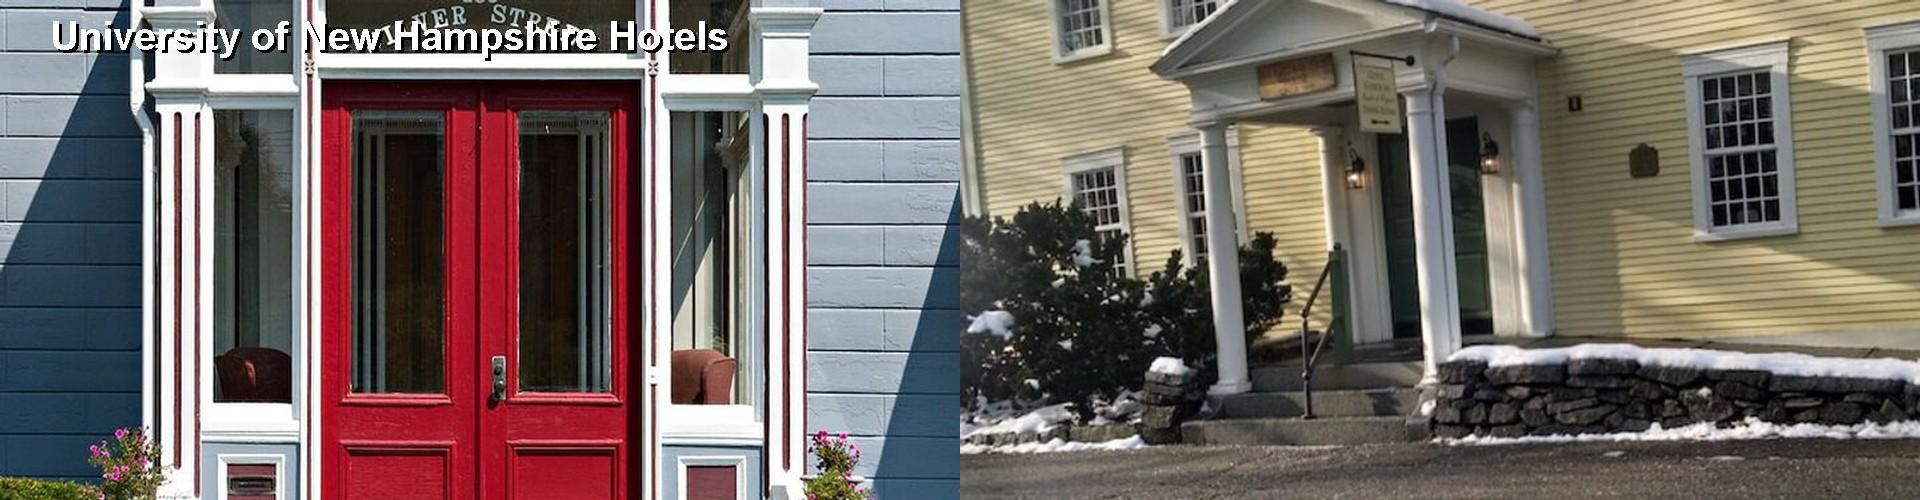 5 Best Hotels Near University Of New Hampshire